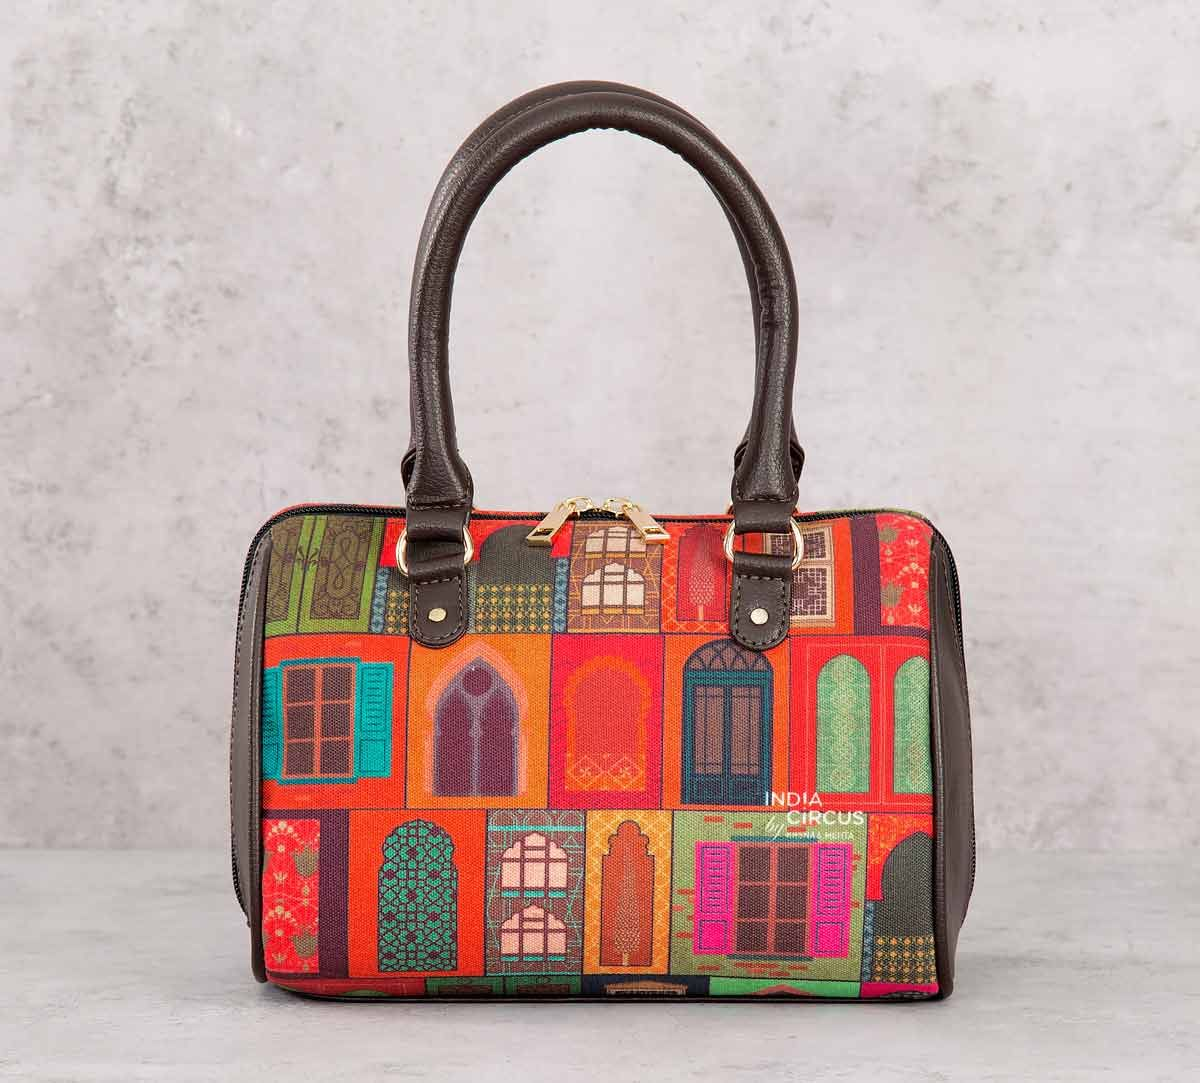 India Circus Mughal Doors Reiteration Small Duffle Bag